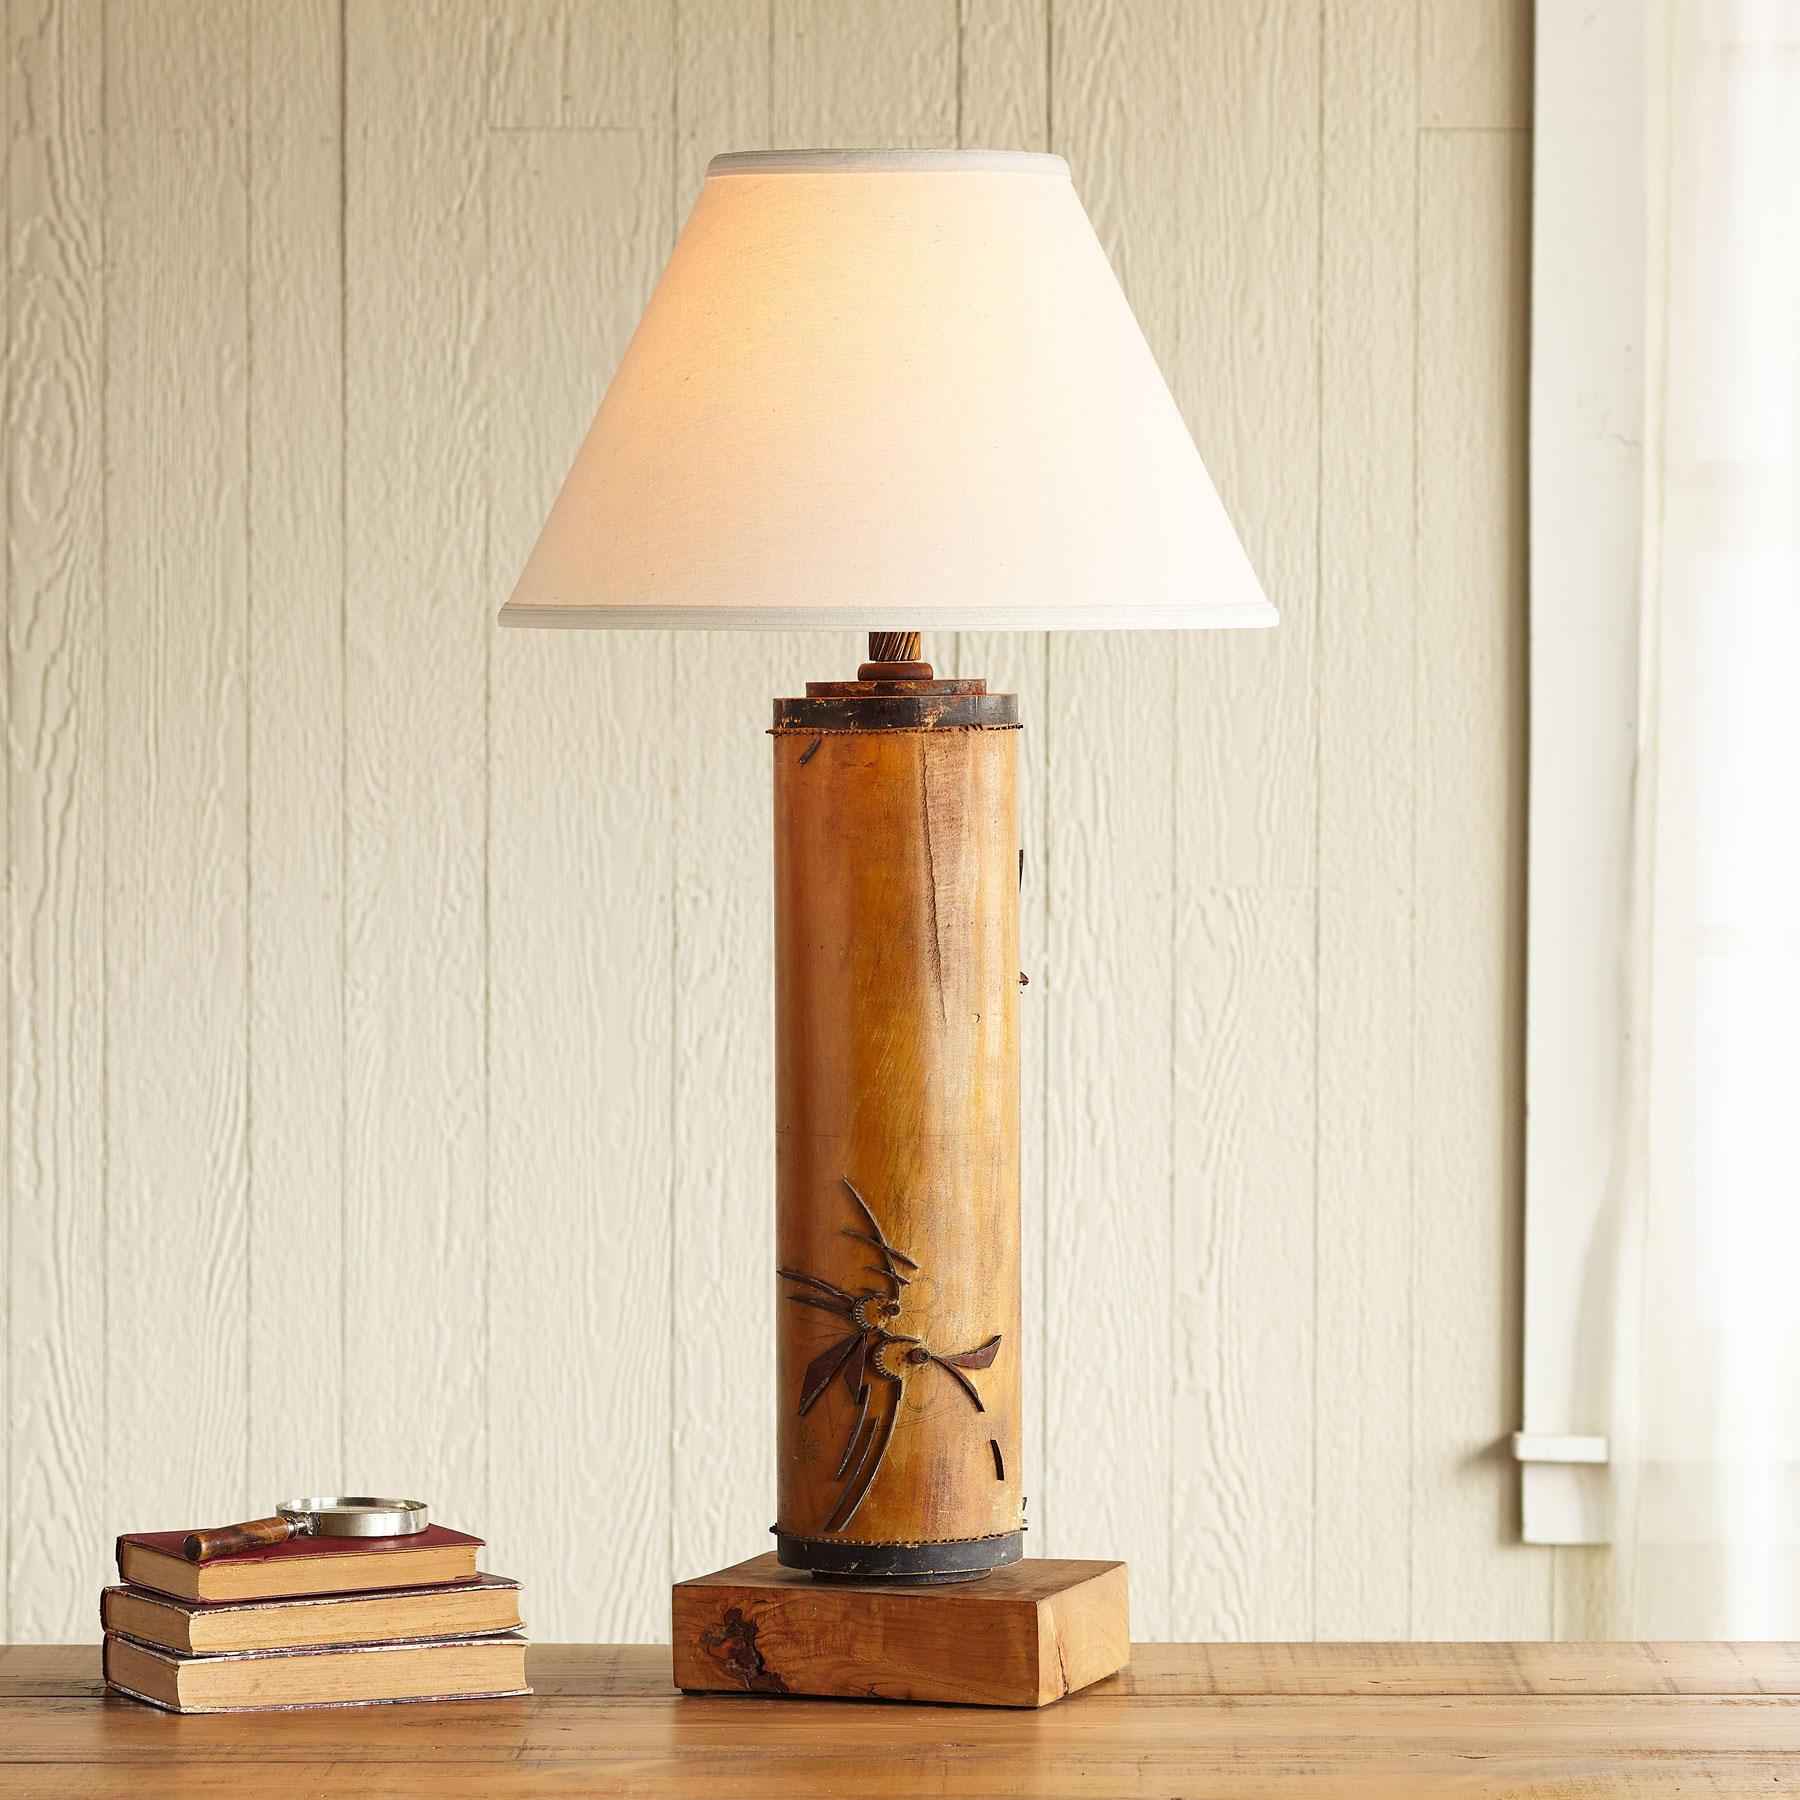 One-of-a-kind Highclere Vintage Roller Lamp